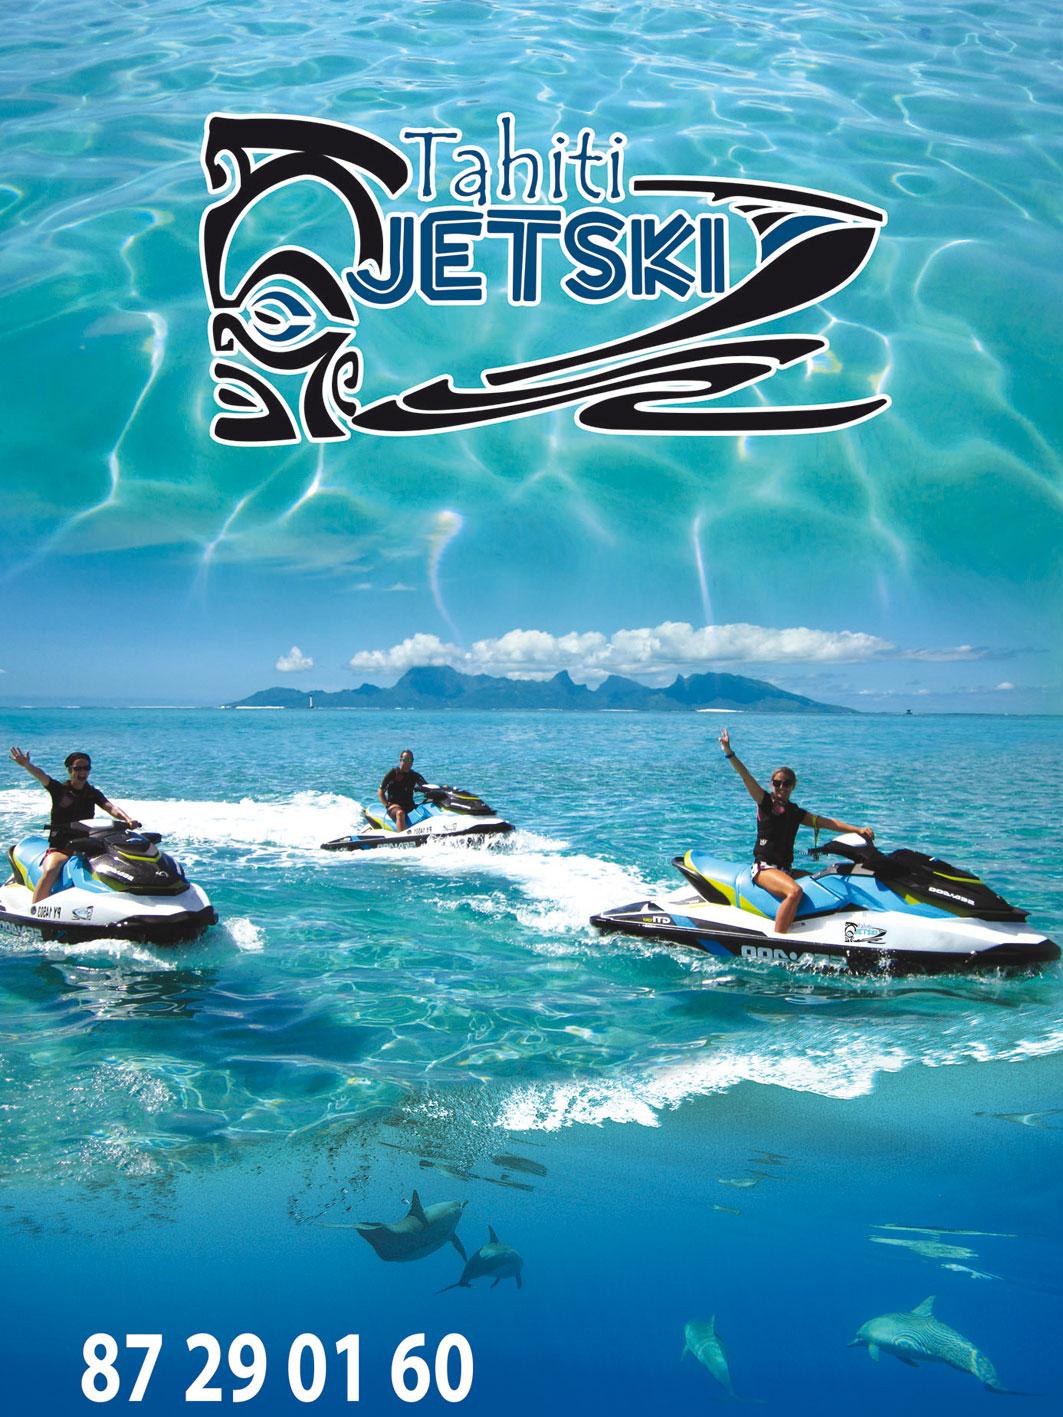 https://tahititourisme.nz/wp-content/uploads/2017/08/Affiche-Tahiti-Jet-Ski-2016-web.jpg